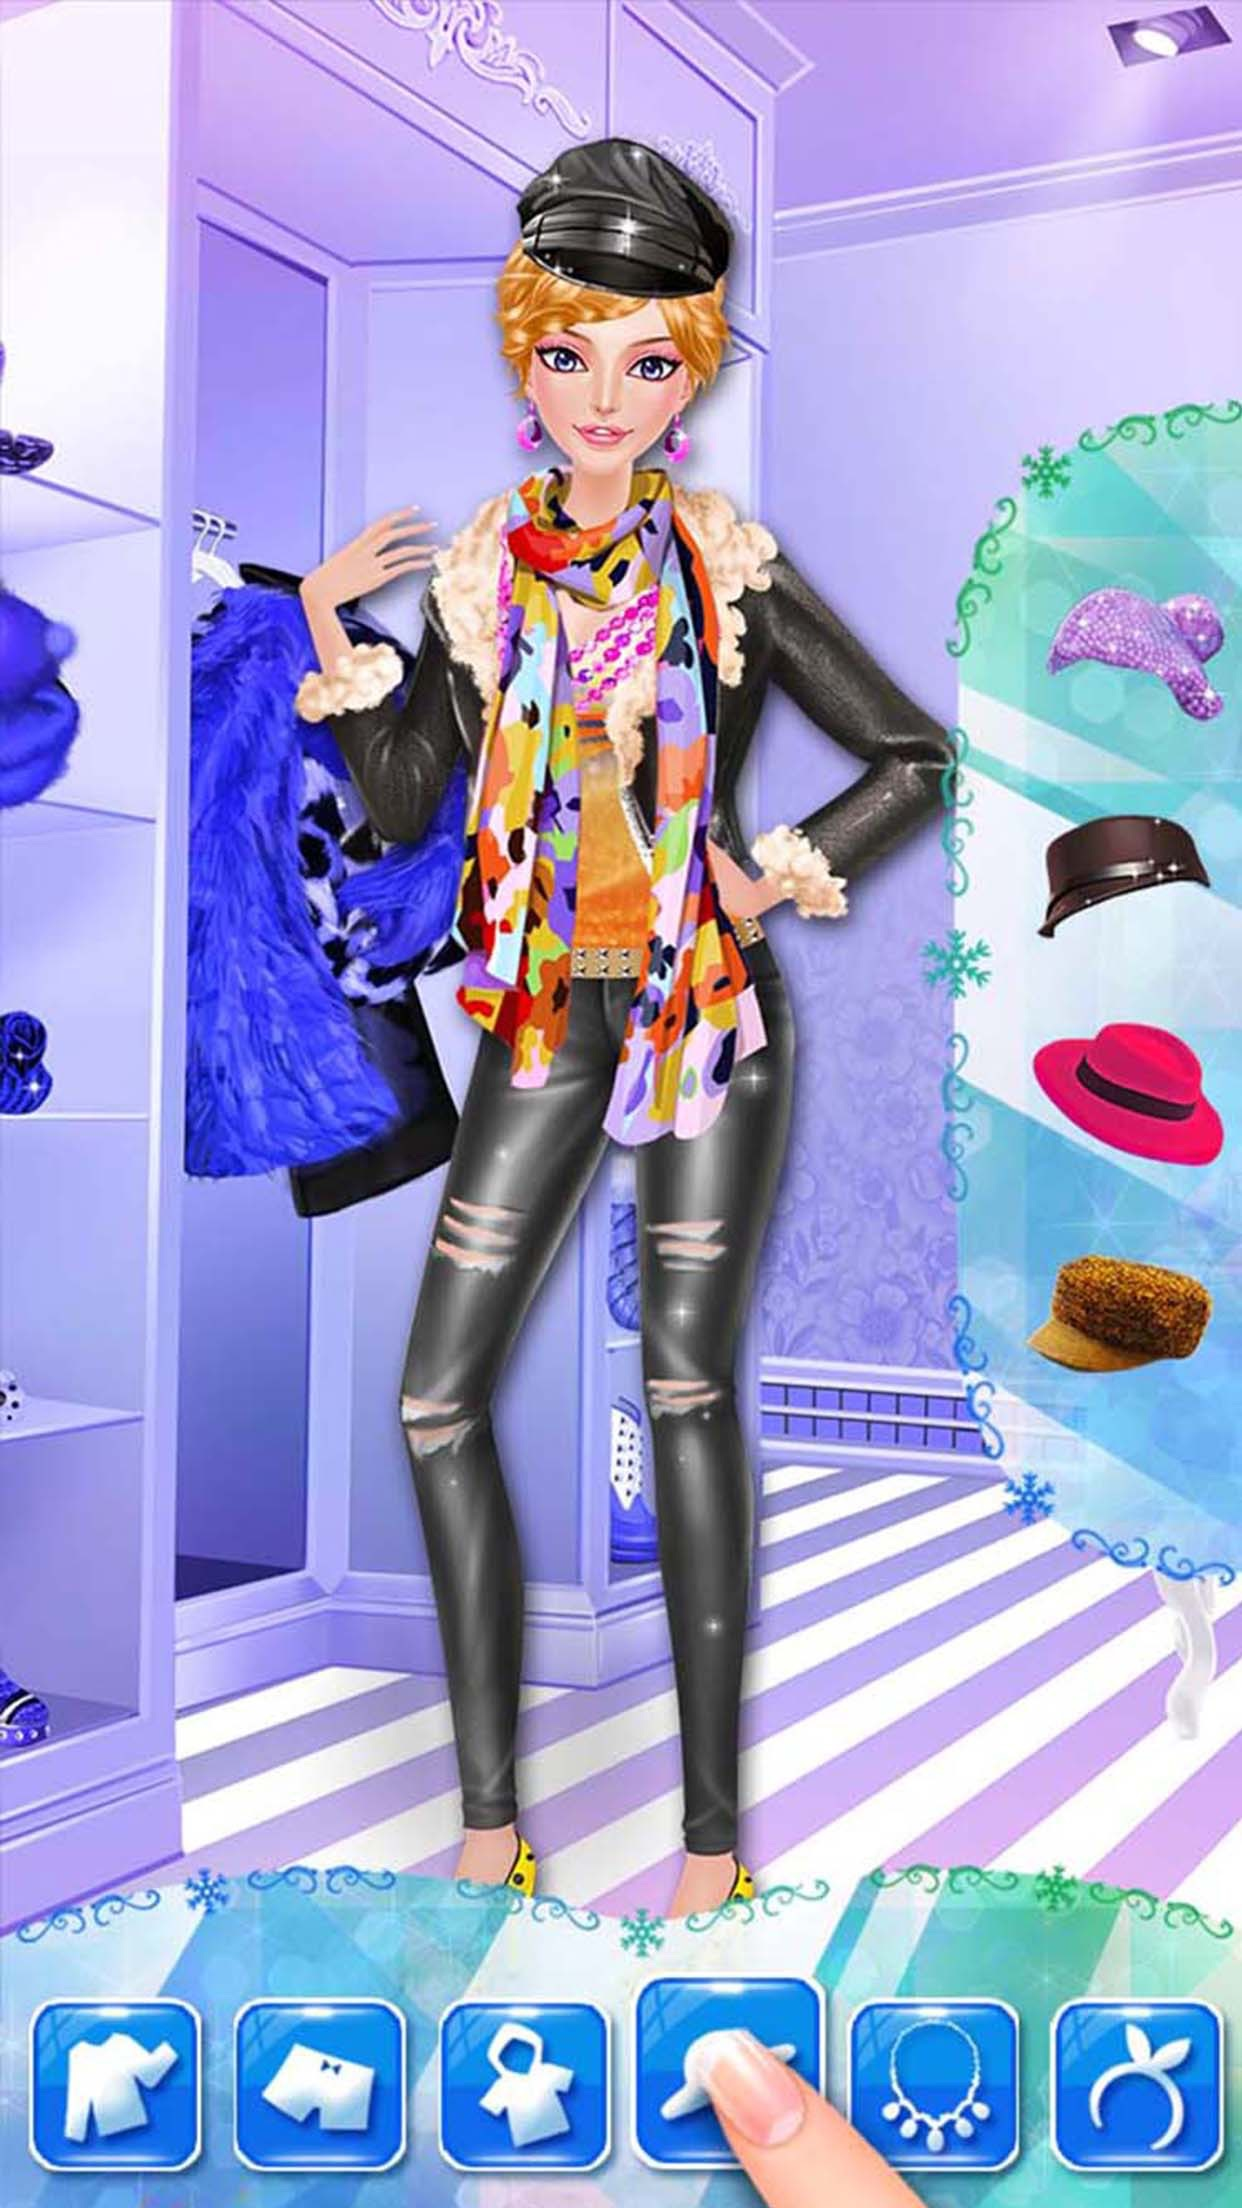 Winter Fashion - North Pole Snowy Closet Screenshot